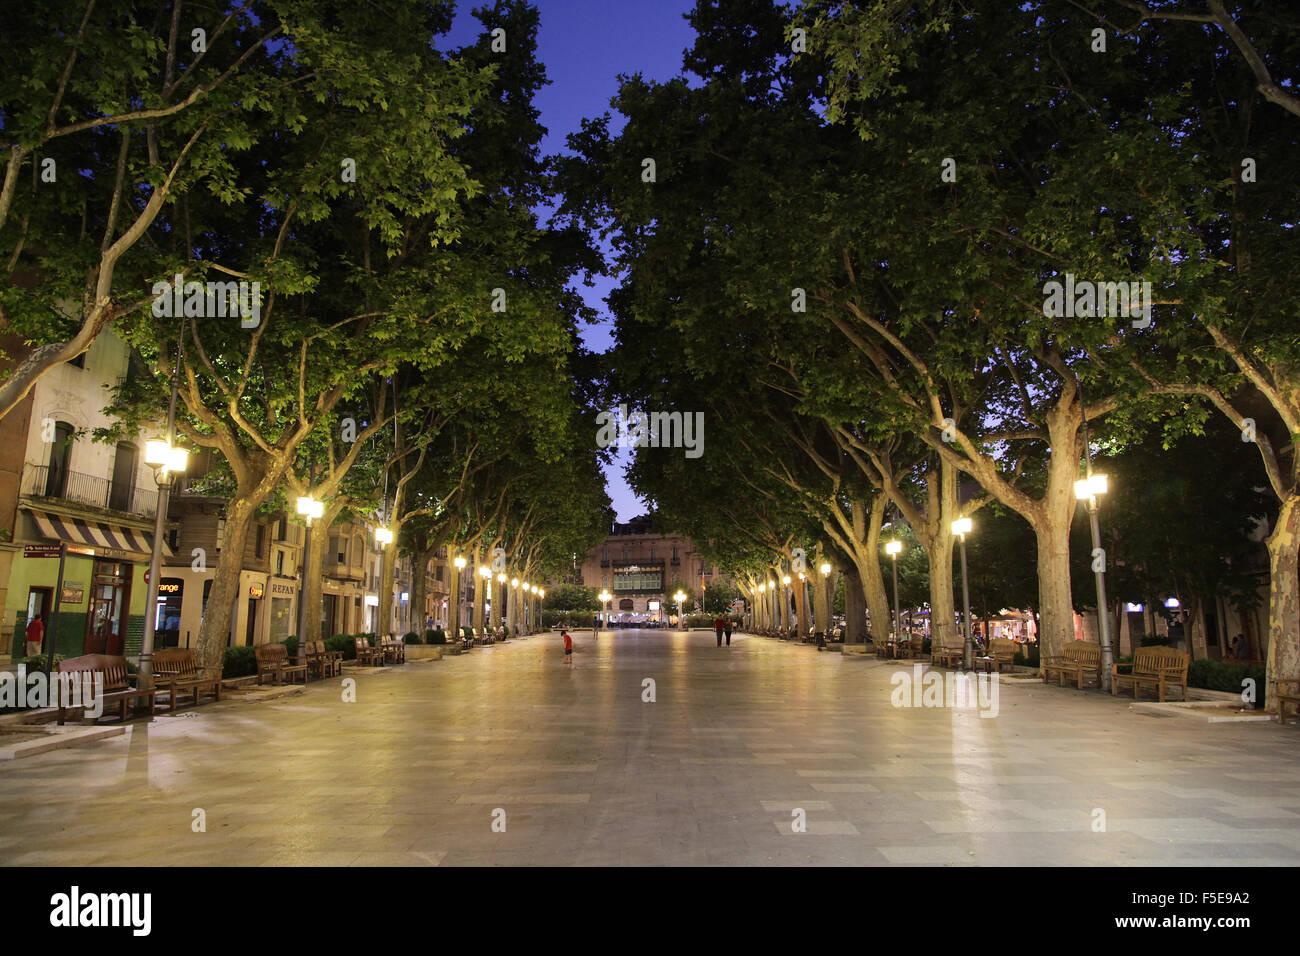 La Rambla Figueres Girona Catalonia Spain - Stock Image